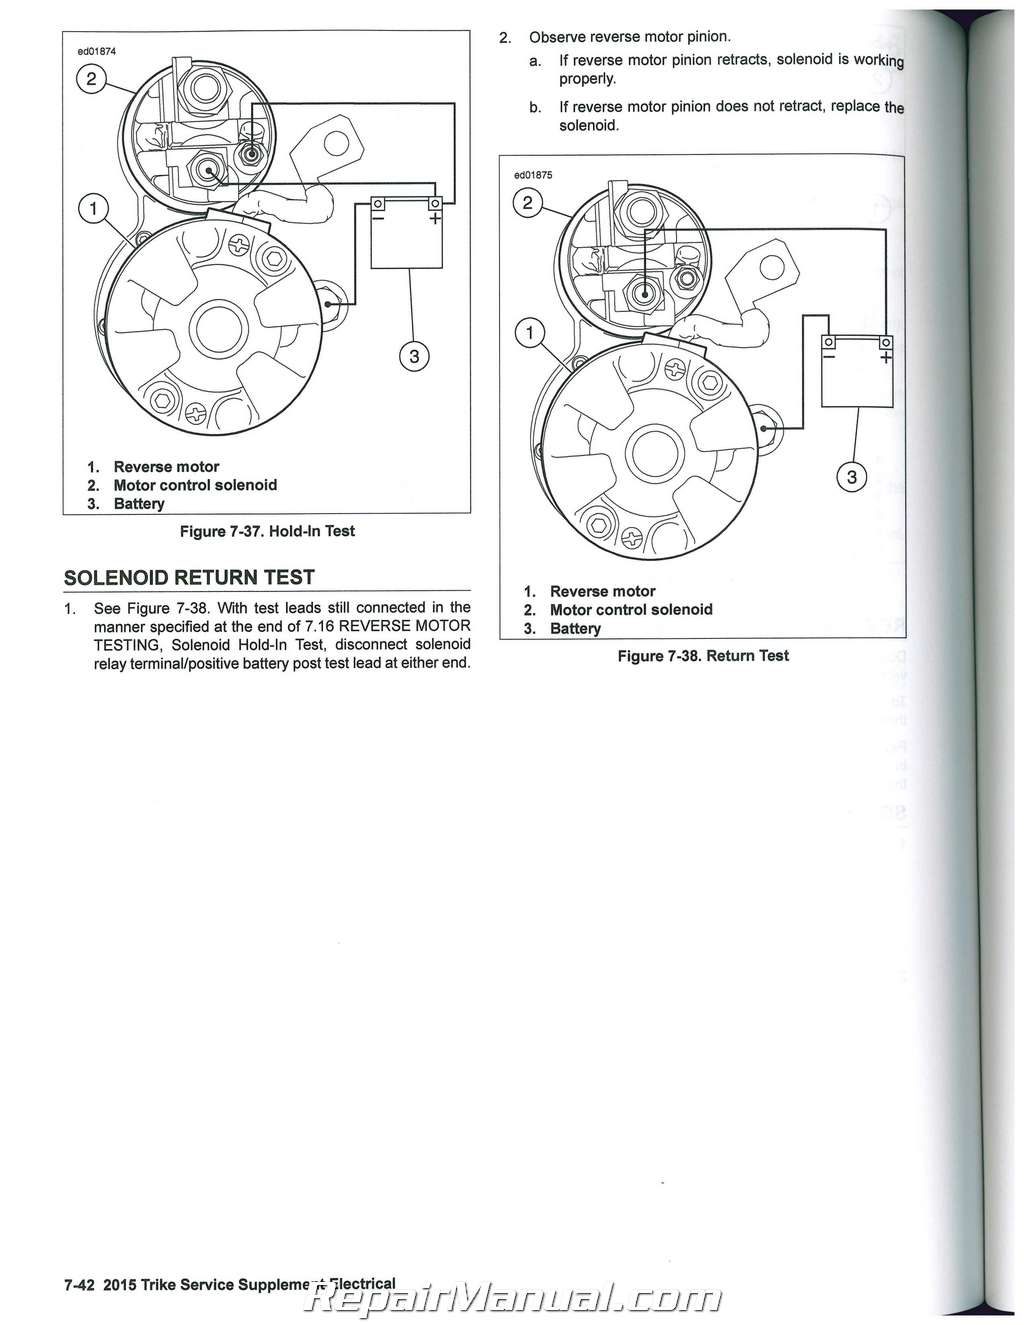 v rod service manual pdf